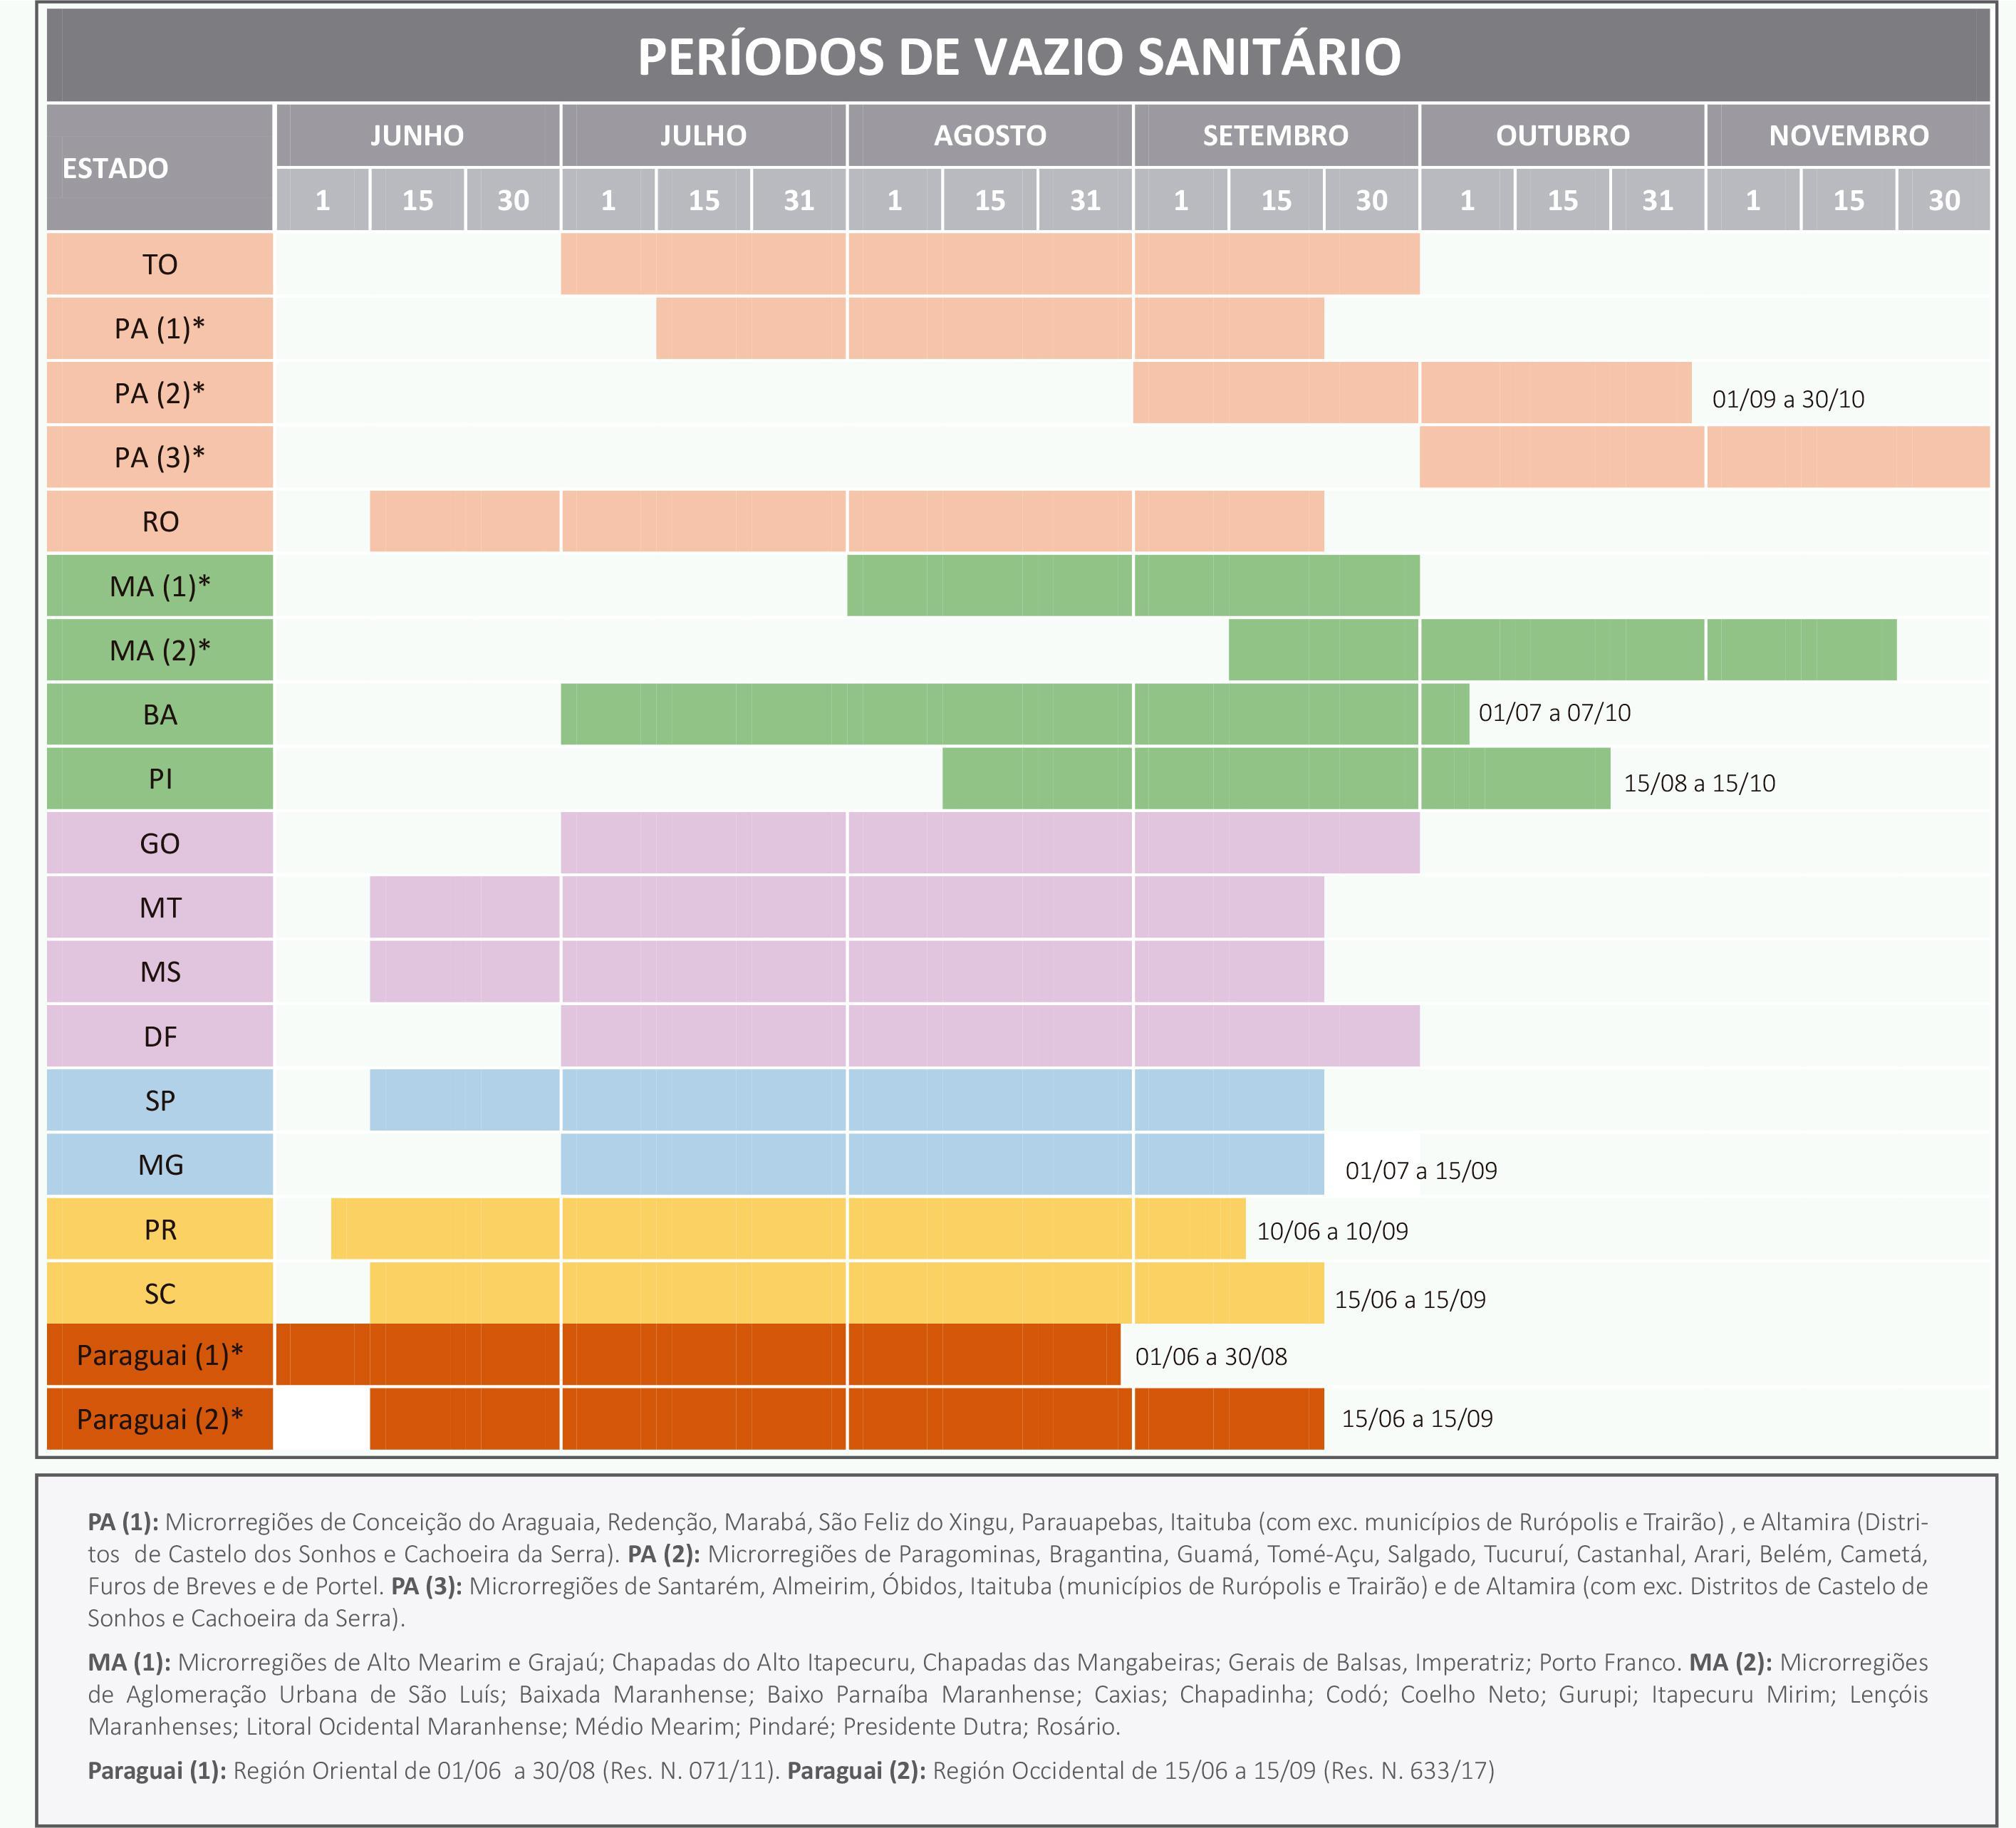 PERIODO_VAZIO-SANITARIO_2020-atualizado